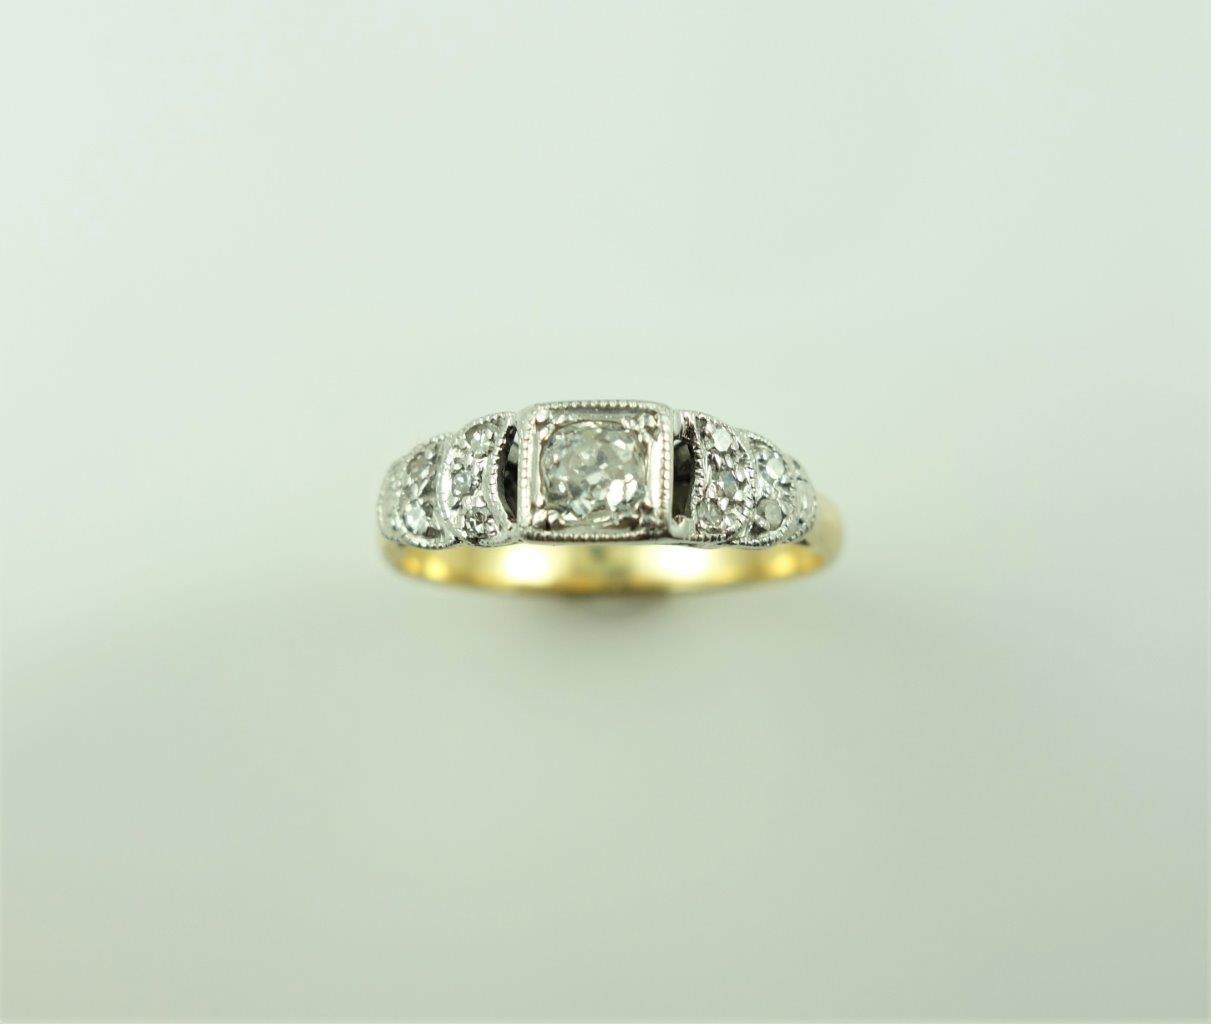 Ring Valuation Sydney